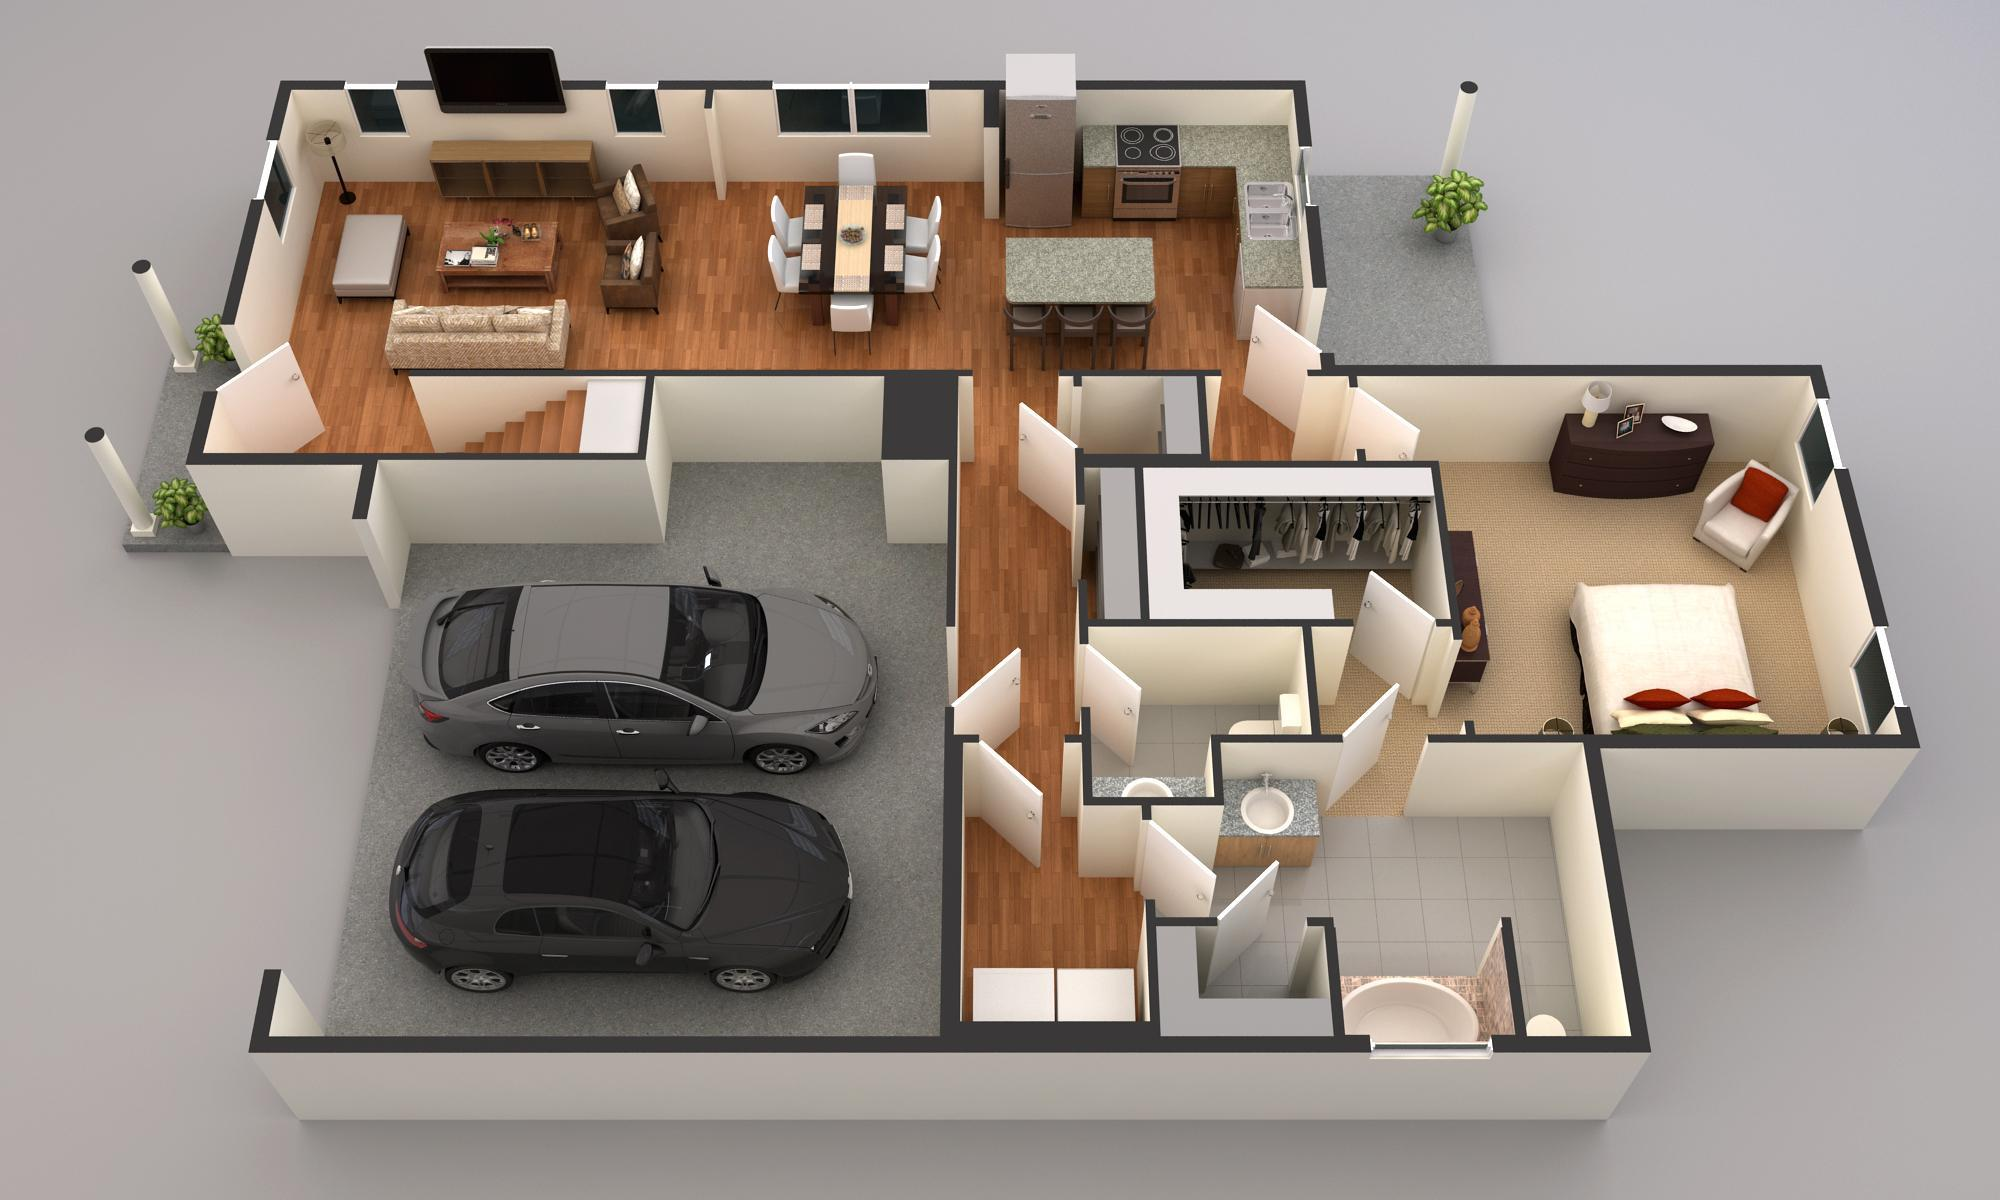 http://partners-dynamic.bdxcdn.com/Images/Homes/GoodallHomebuilder/max1500_27738858-180725.jpg